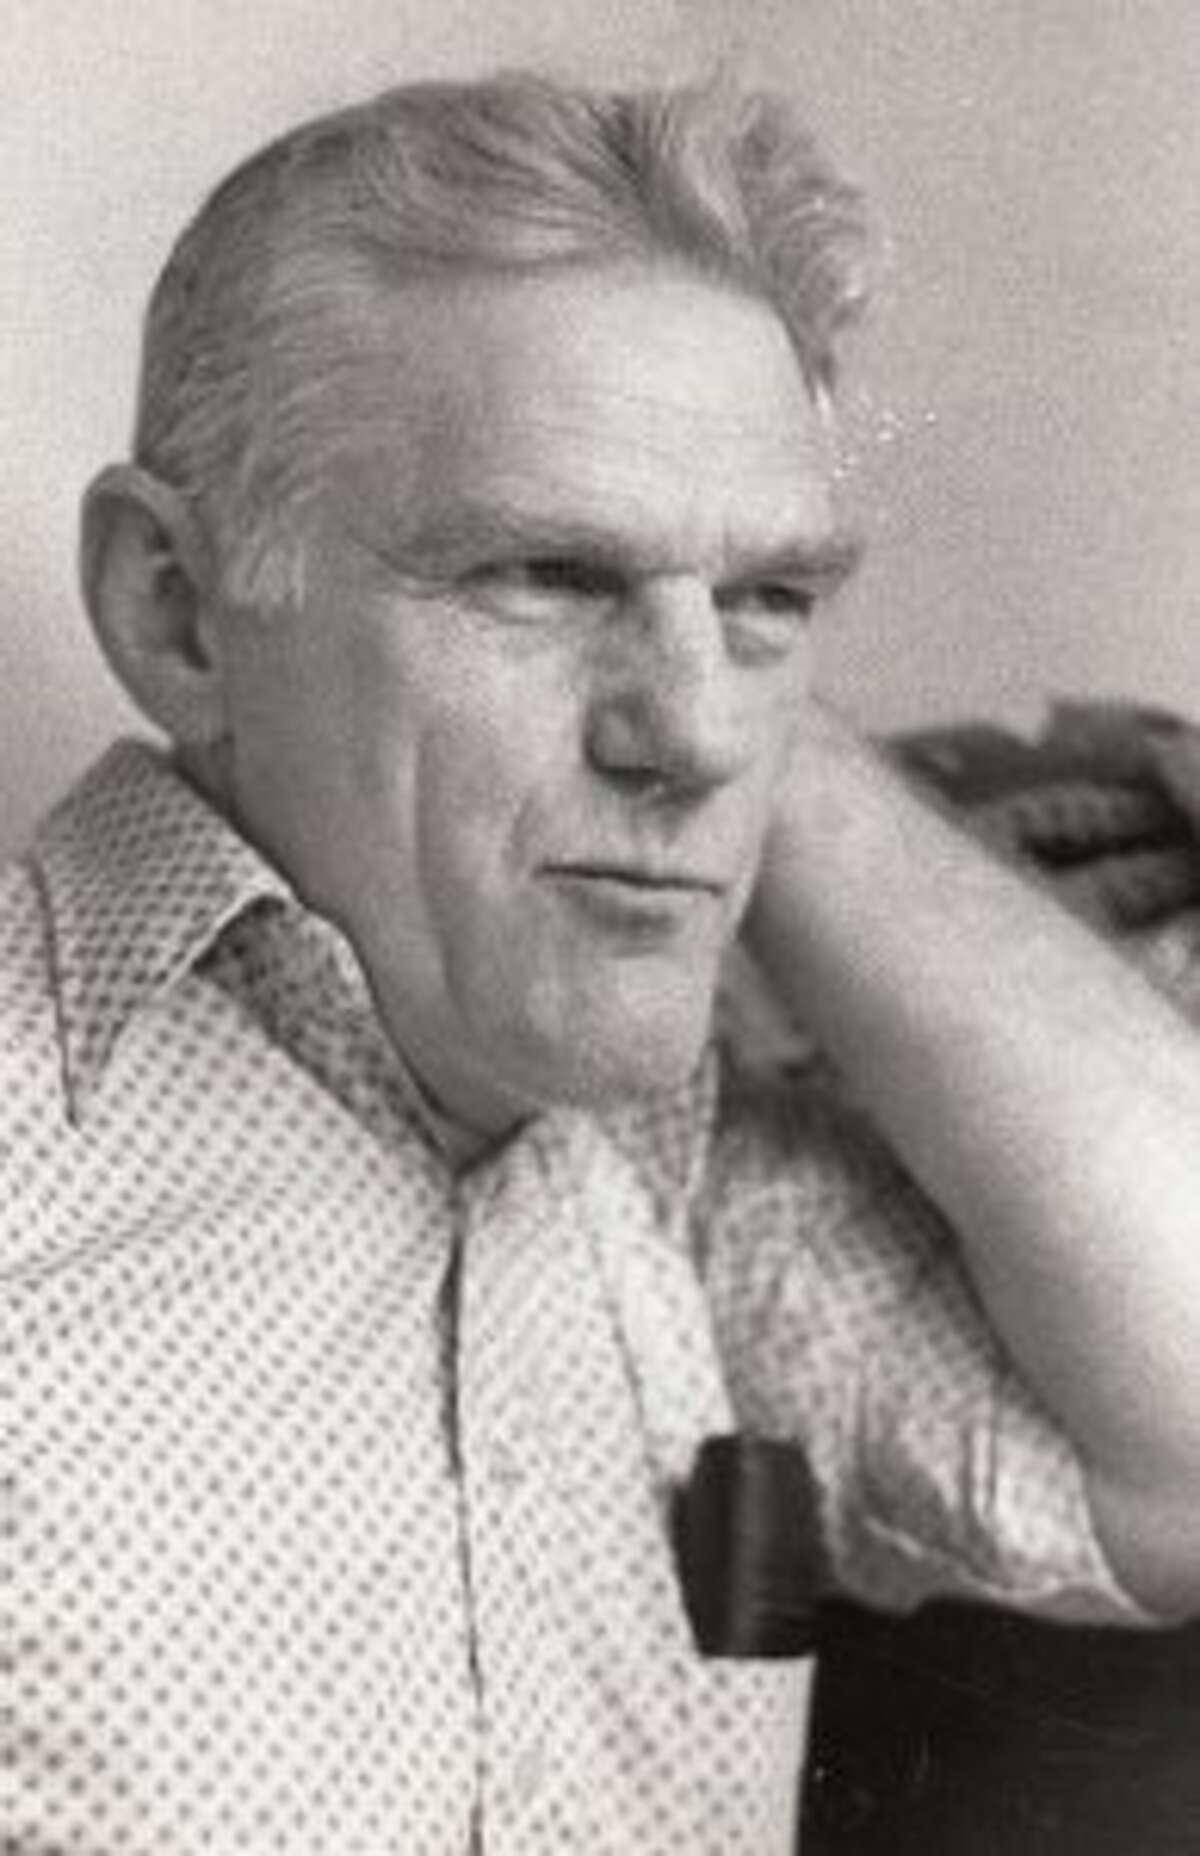 Robert Peter Adams